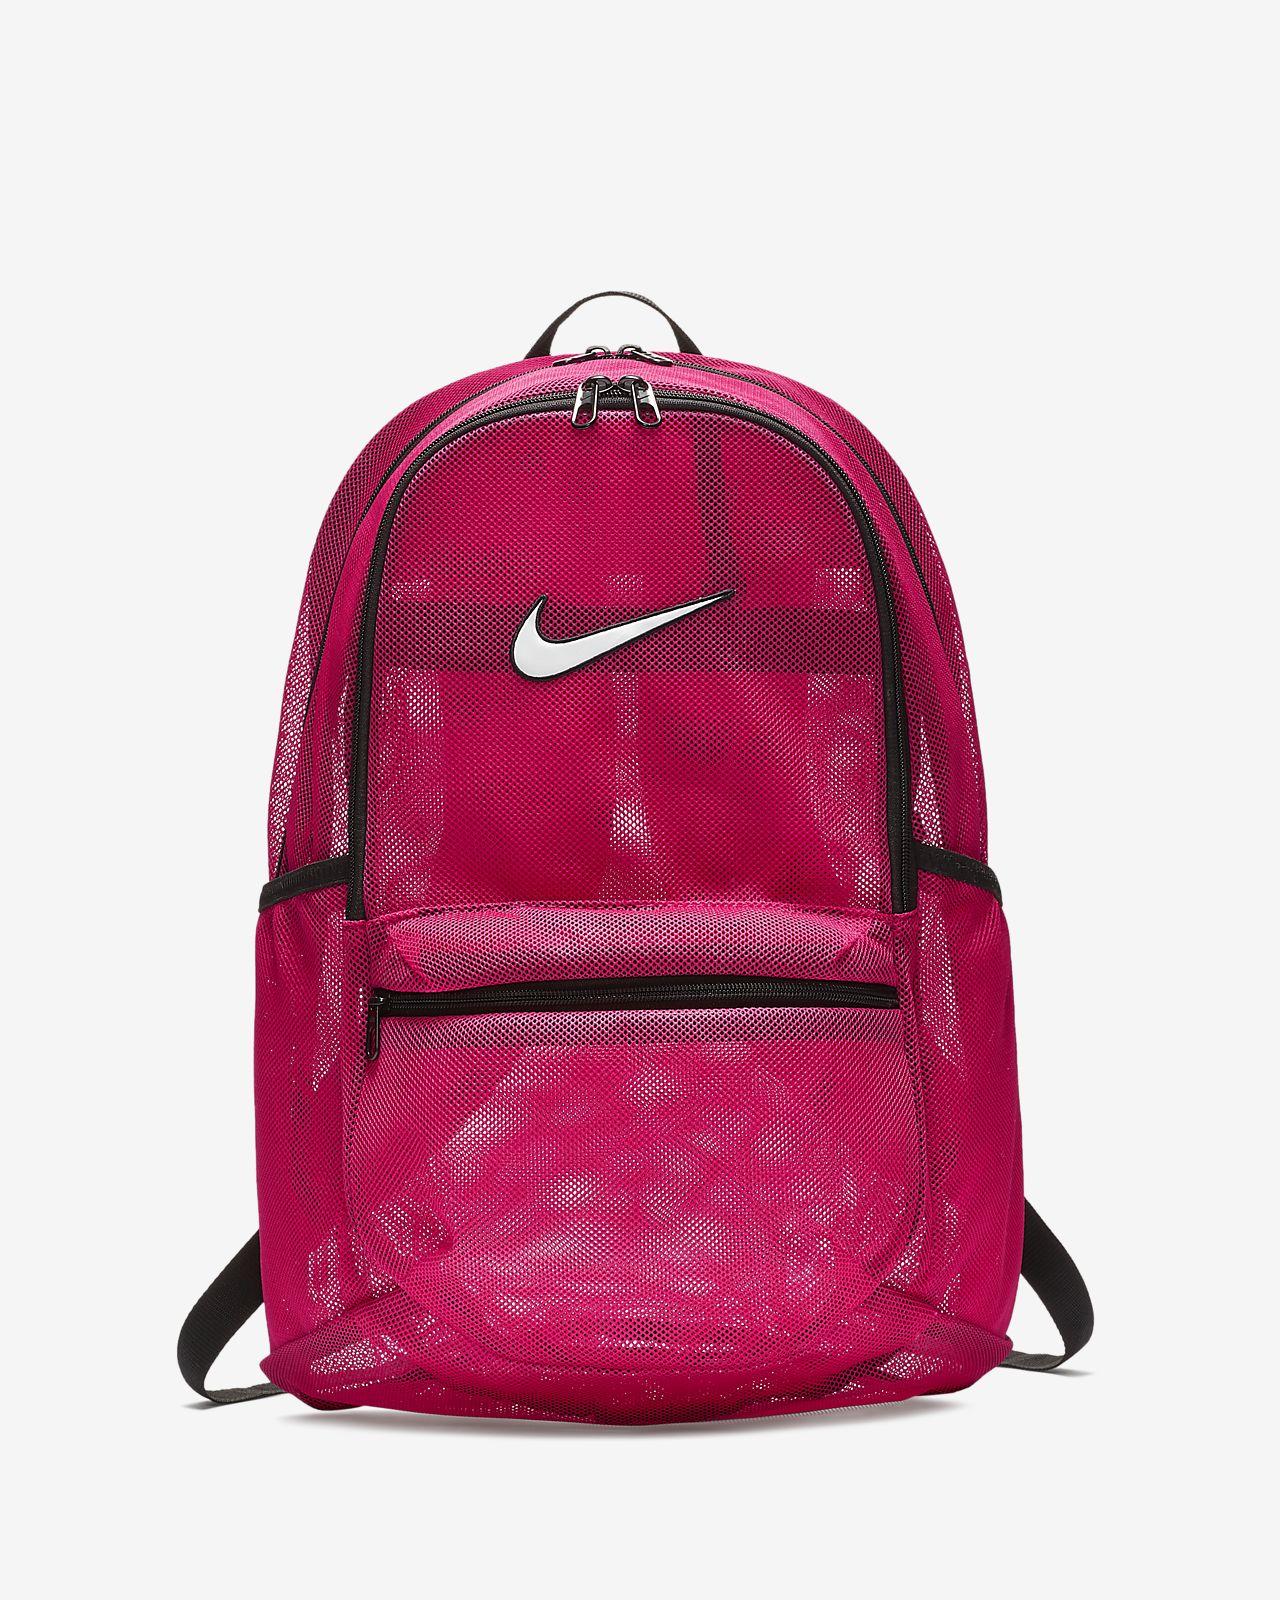 12a431daa Low Resolution Nike Brasilia Mesh Training Backpack Nike Brasilia Mesh  Training Backpack